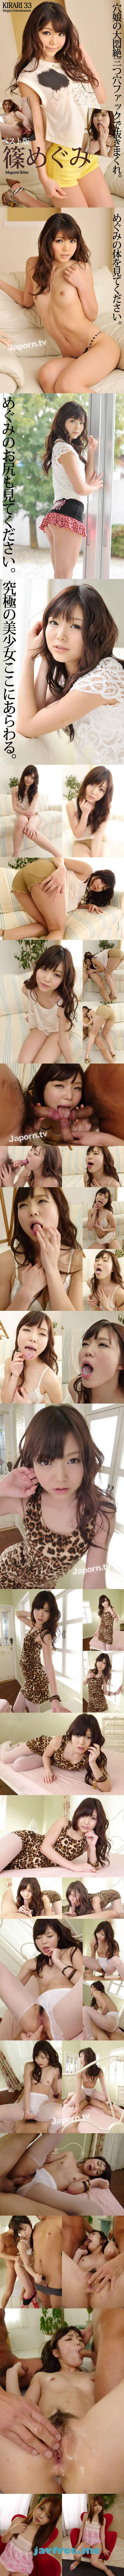 [MKD-S33] KIRARI 33 ~The Best of 篠めぐみ~ : 篠めぐみ - image MKD-S33a on https://javfree.me